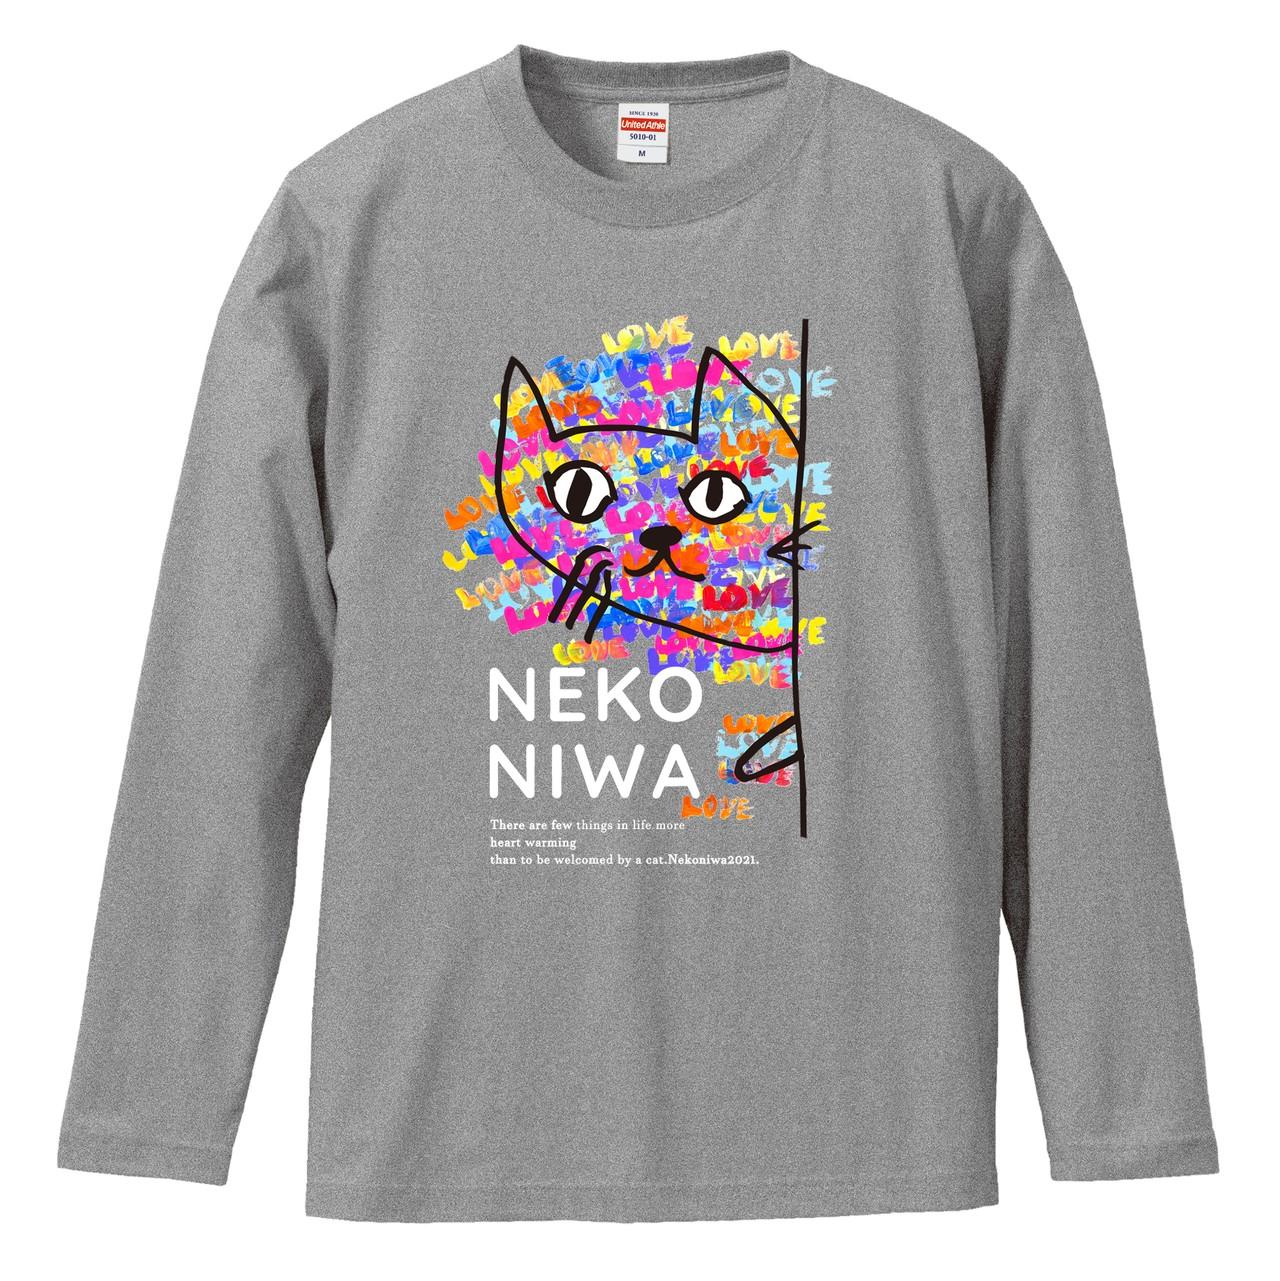 【NEW】2021.love&energy 猫庭ロングスリーブ  Tシャツ【グレー】 ★全国送料無料★